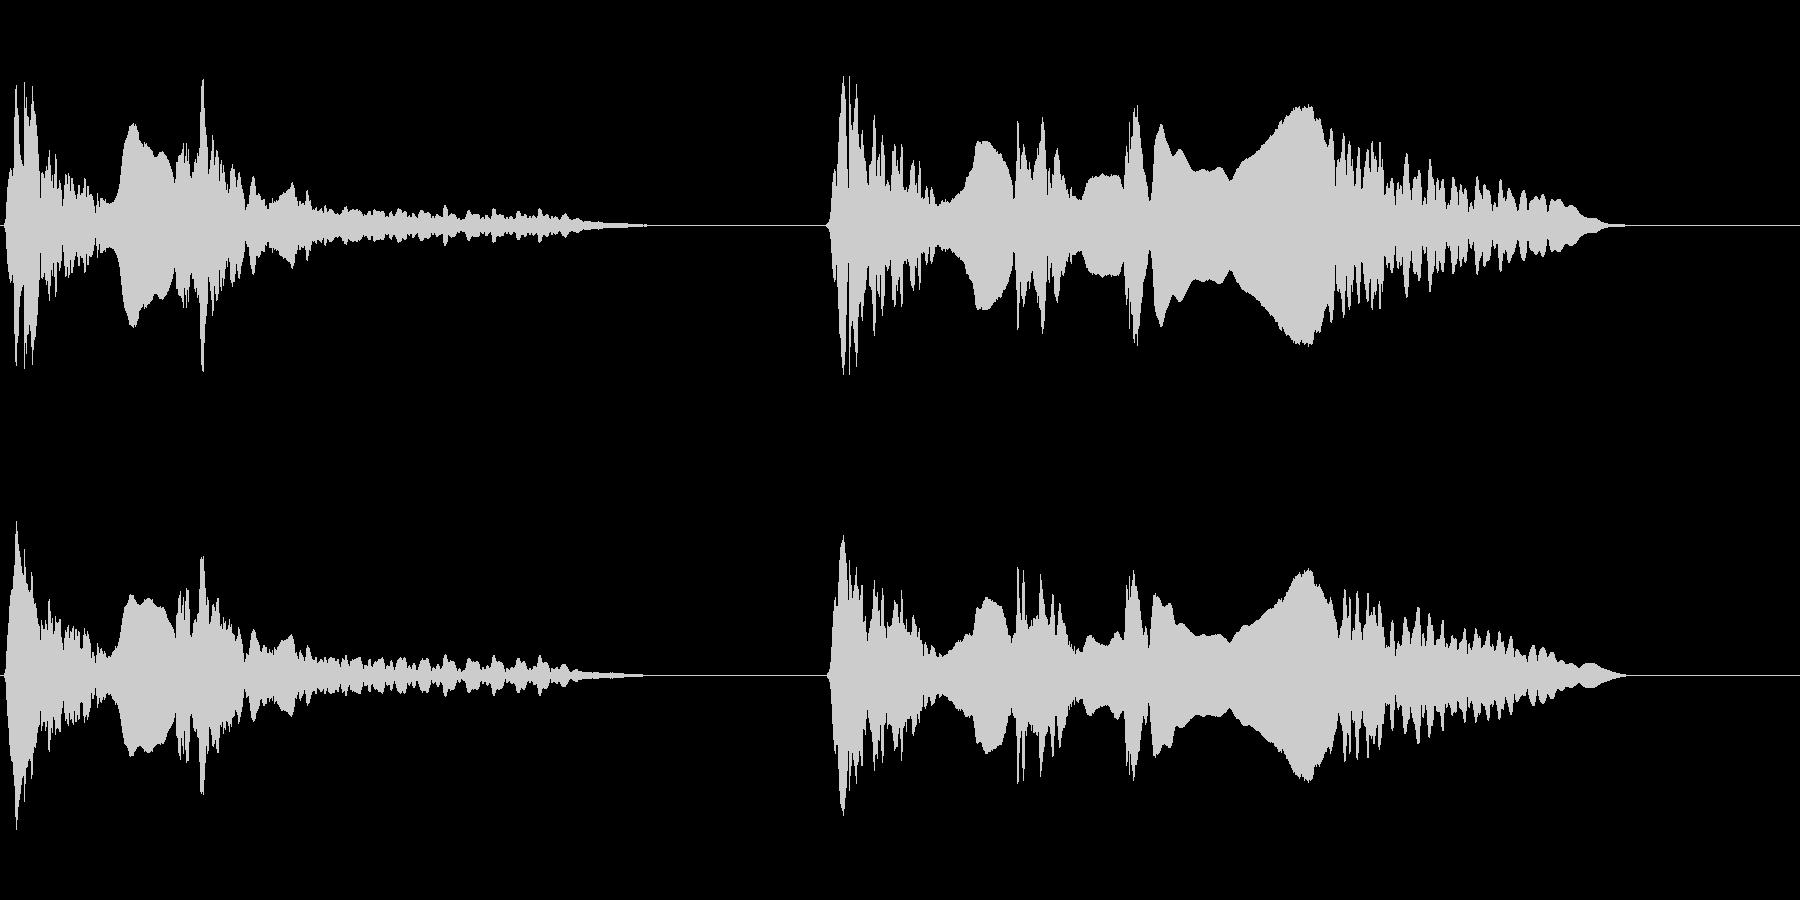 尺八 生演奏 古典風 残響音無 7の未再生の波形